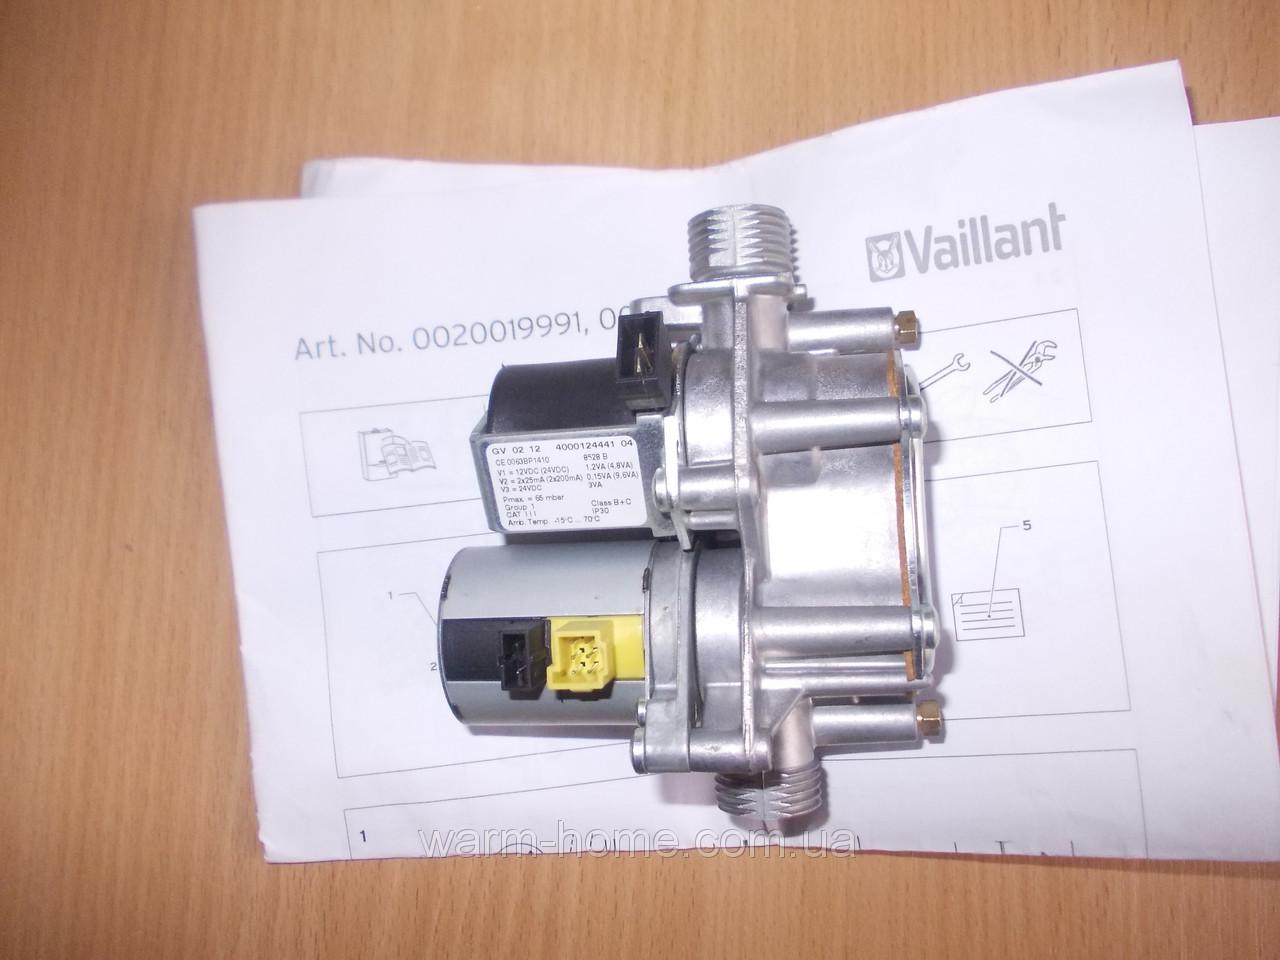 Газовый клапан  GV02 12 4000124441 CE 0063BP1410  Vaillant